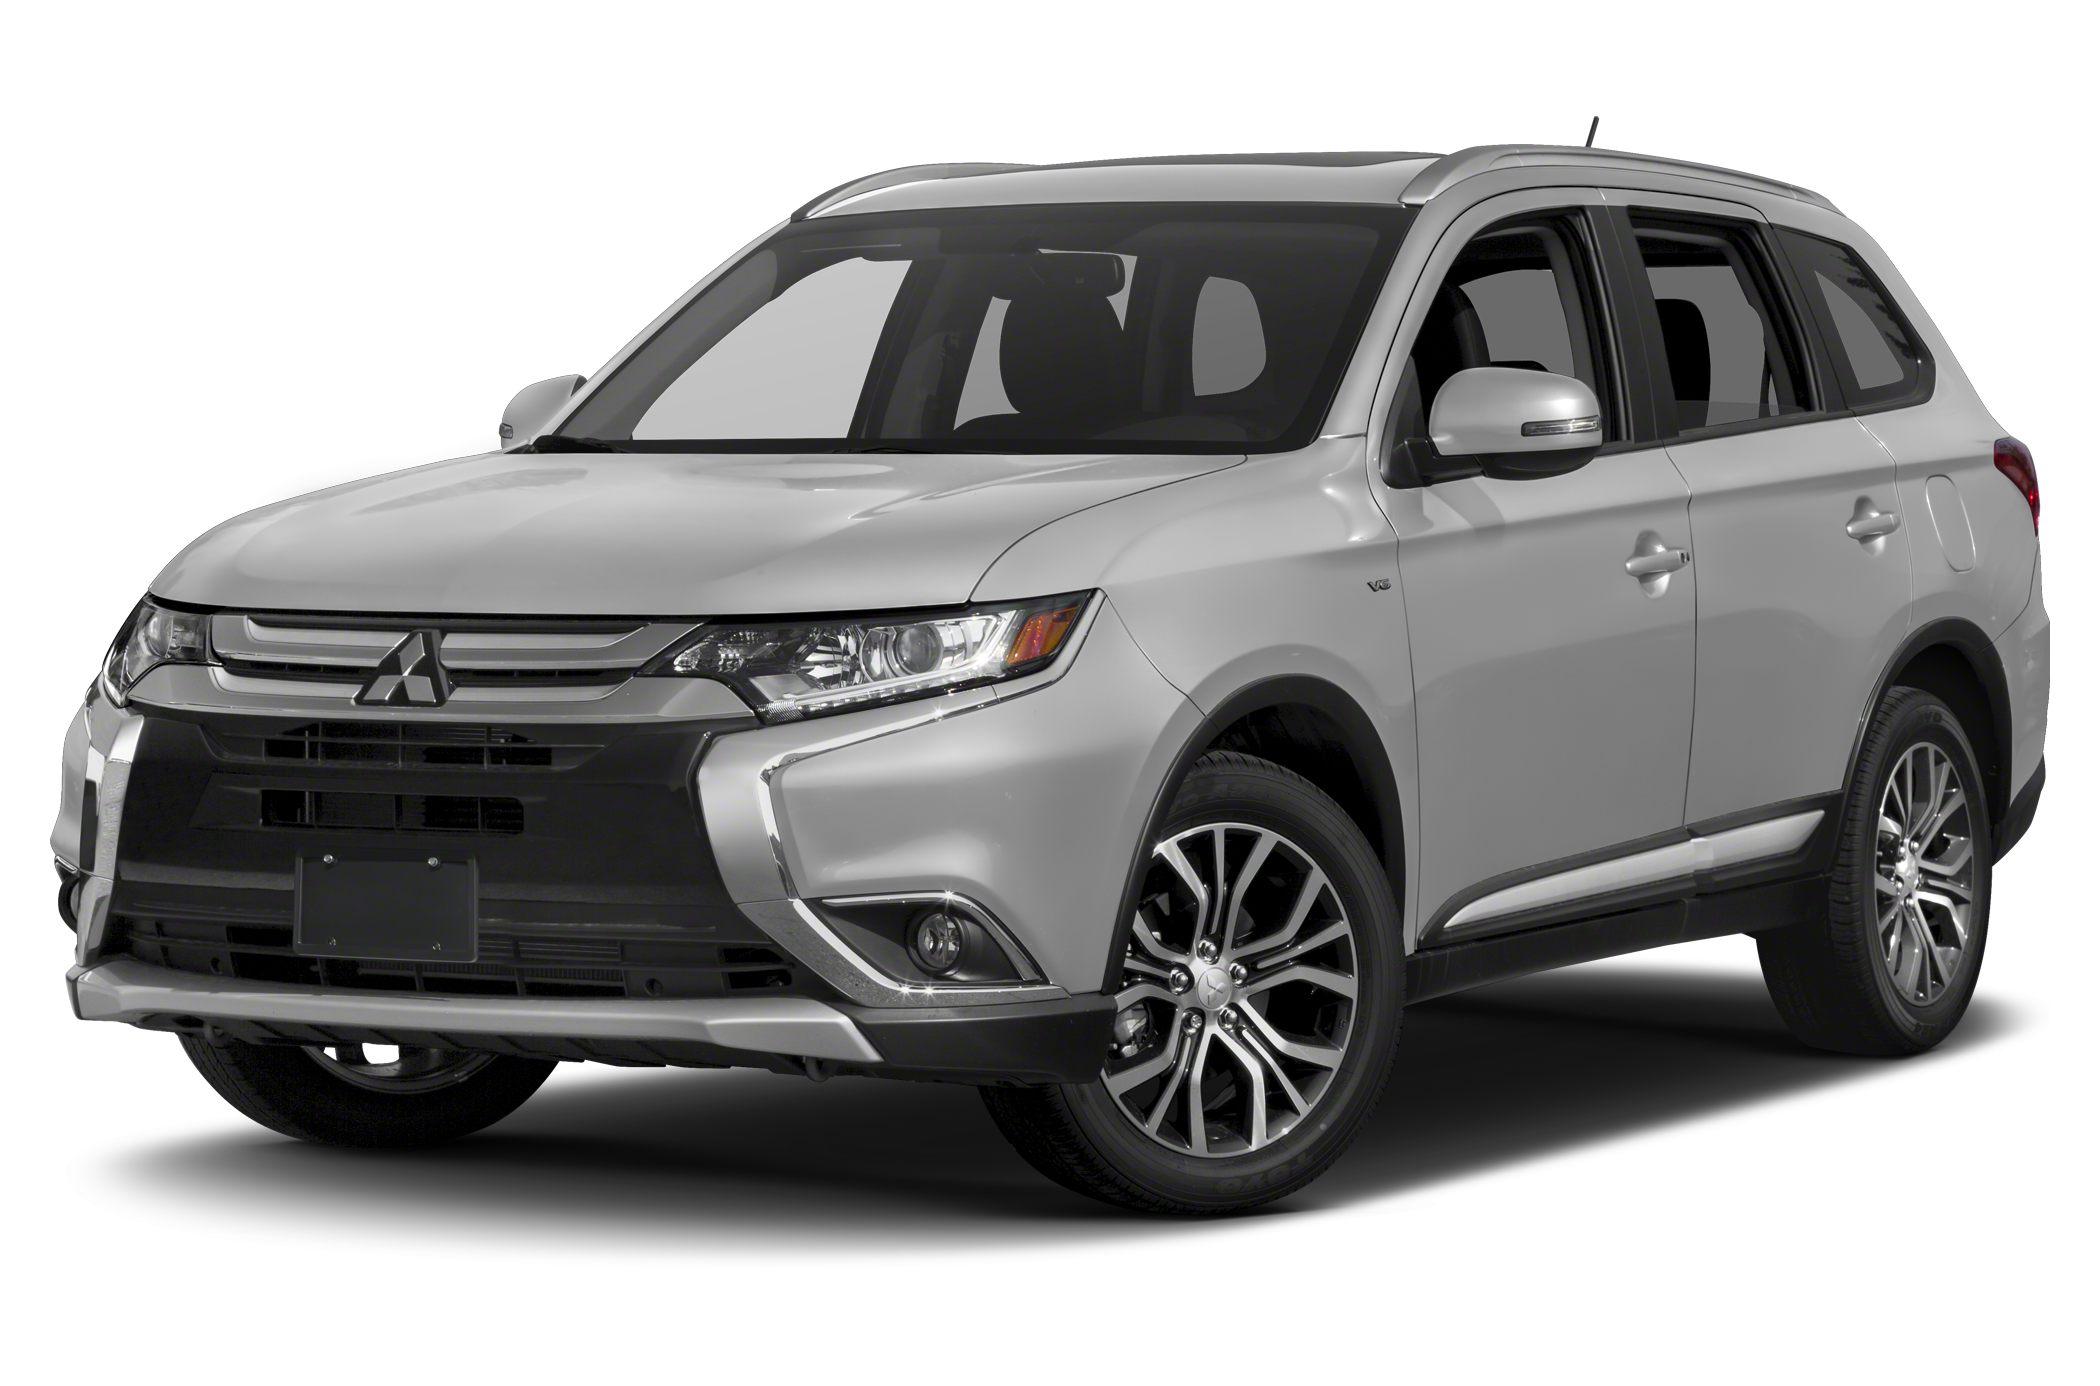 Mitsubishi Outlander News, Photos and Buying Information - Autoblog